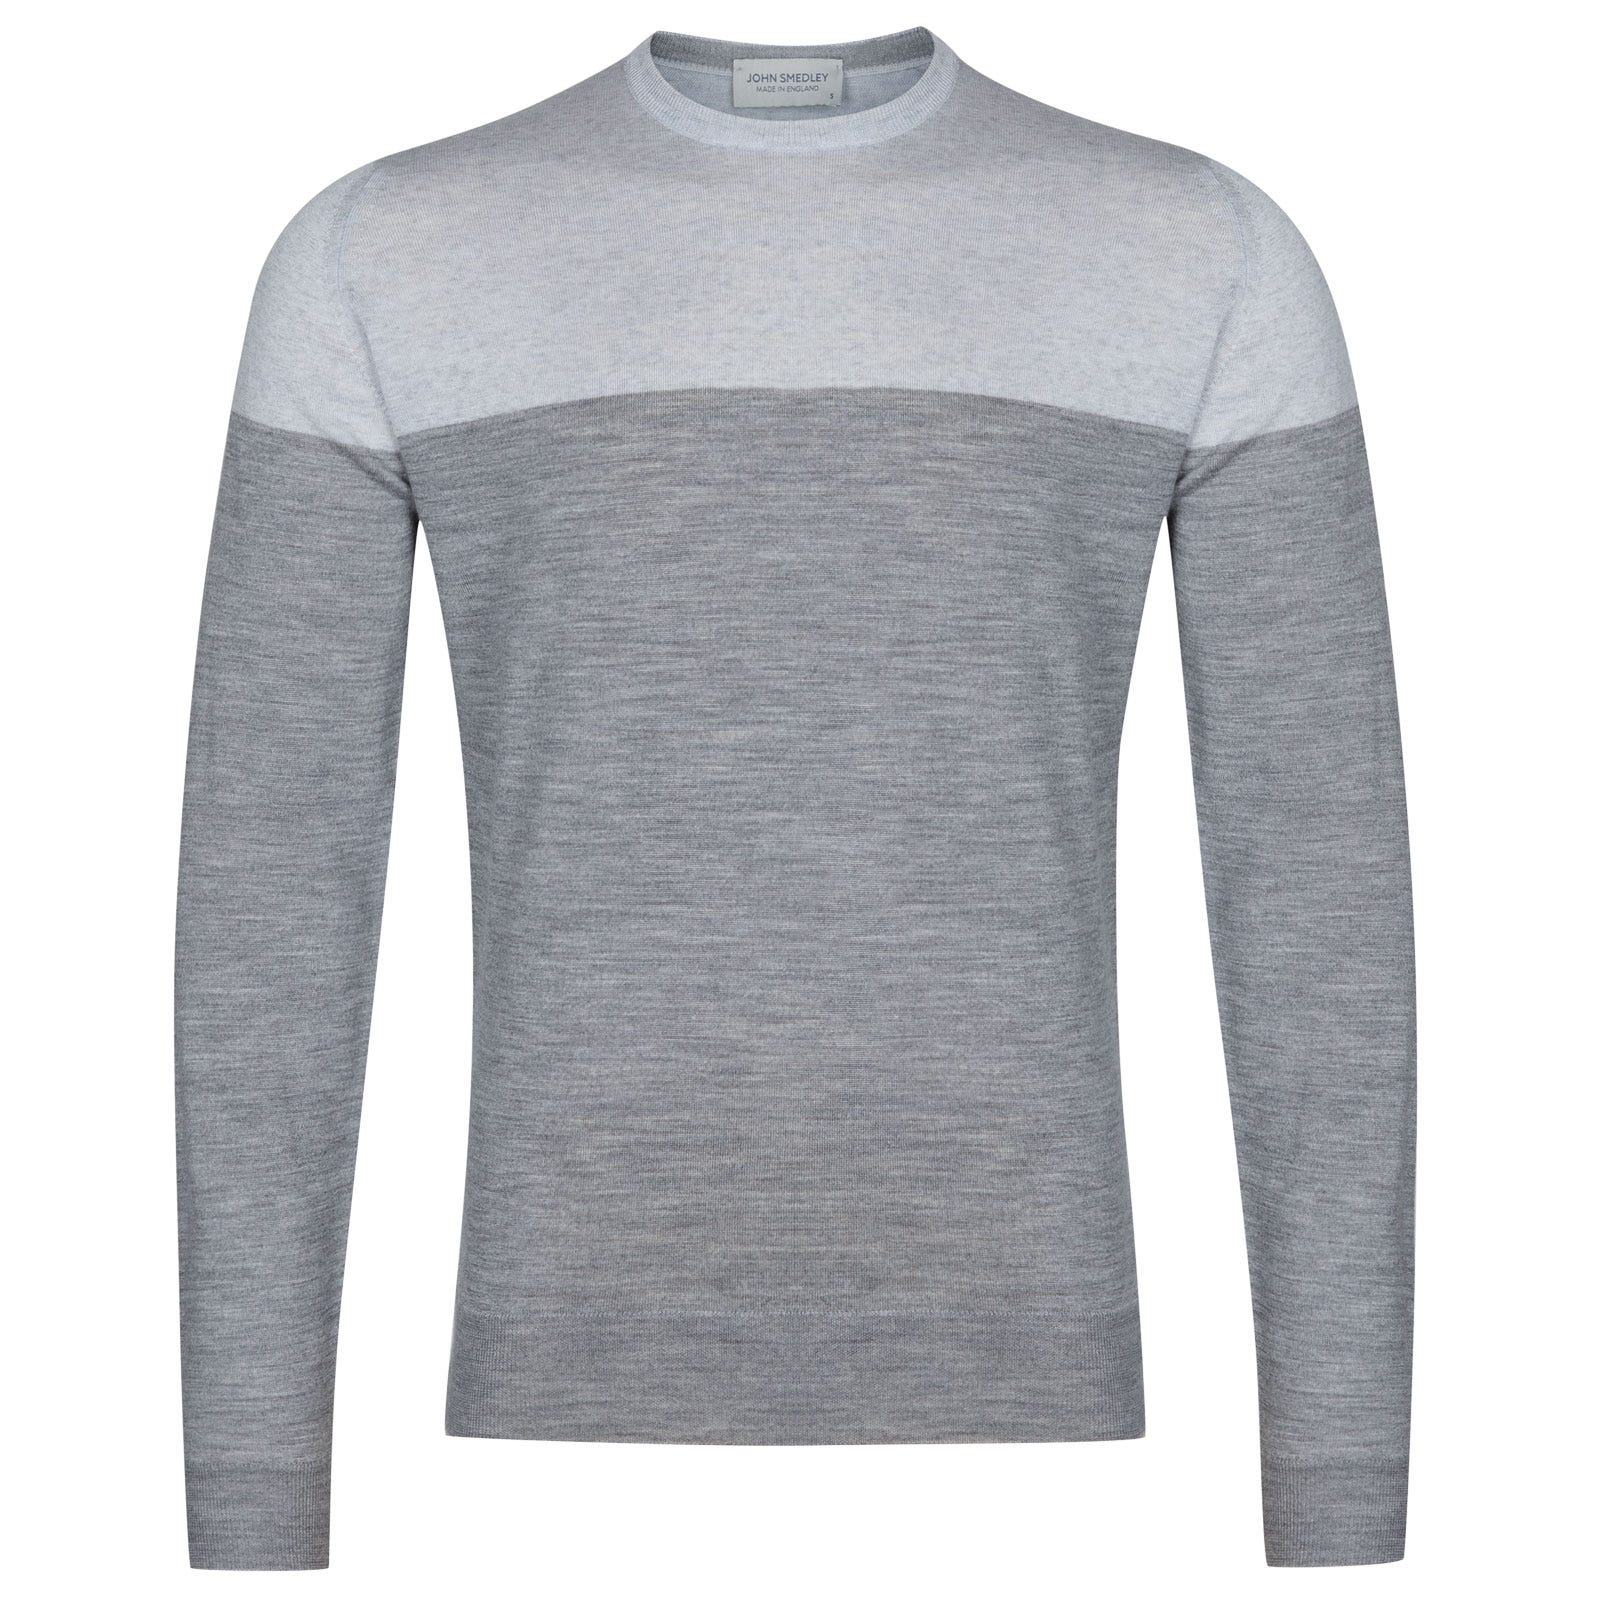 John Smedley Chaldon Extra Fine Merino Pullover in Silver-S